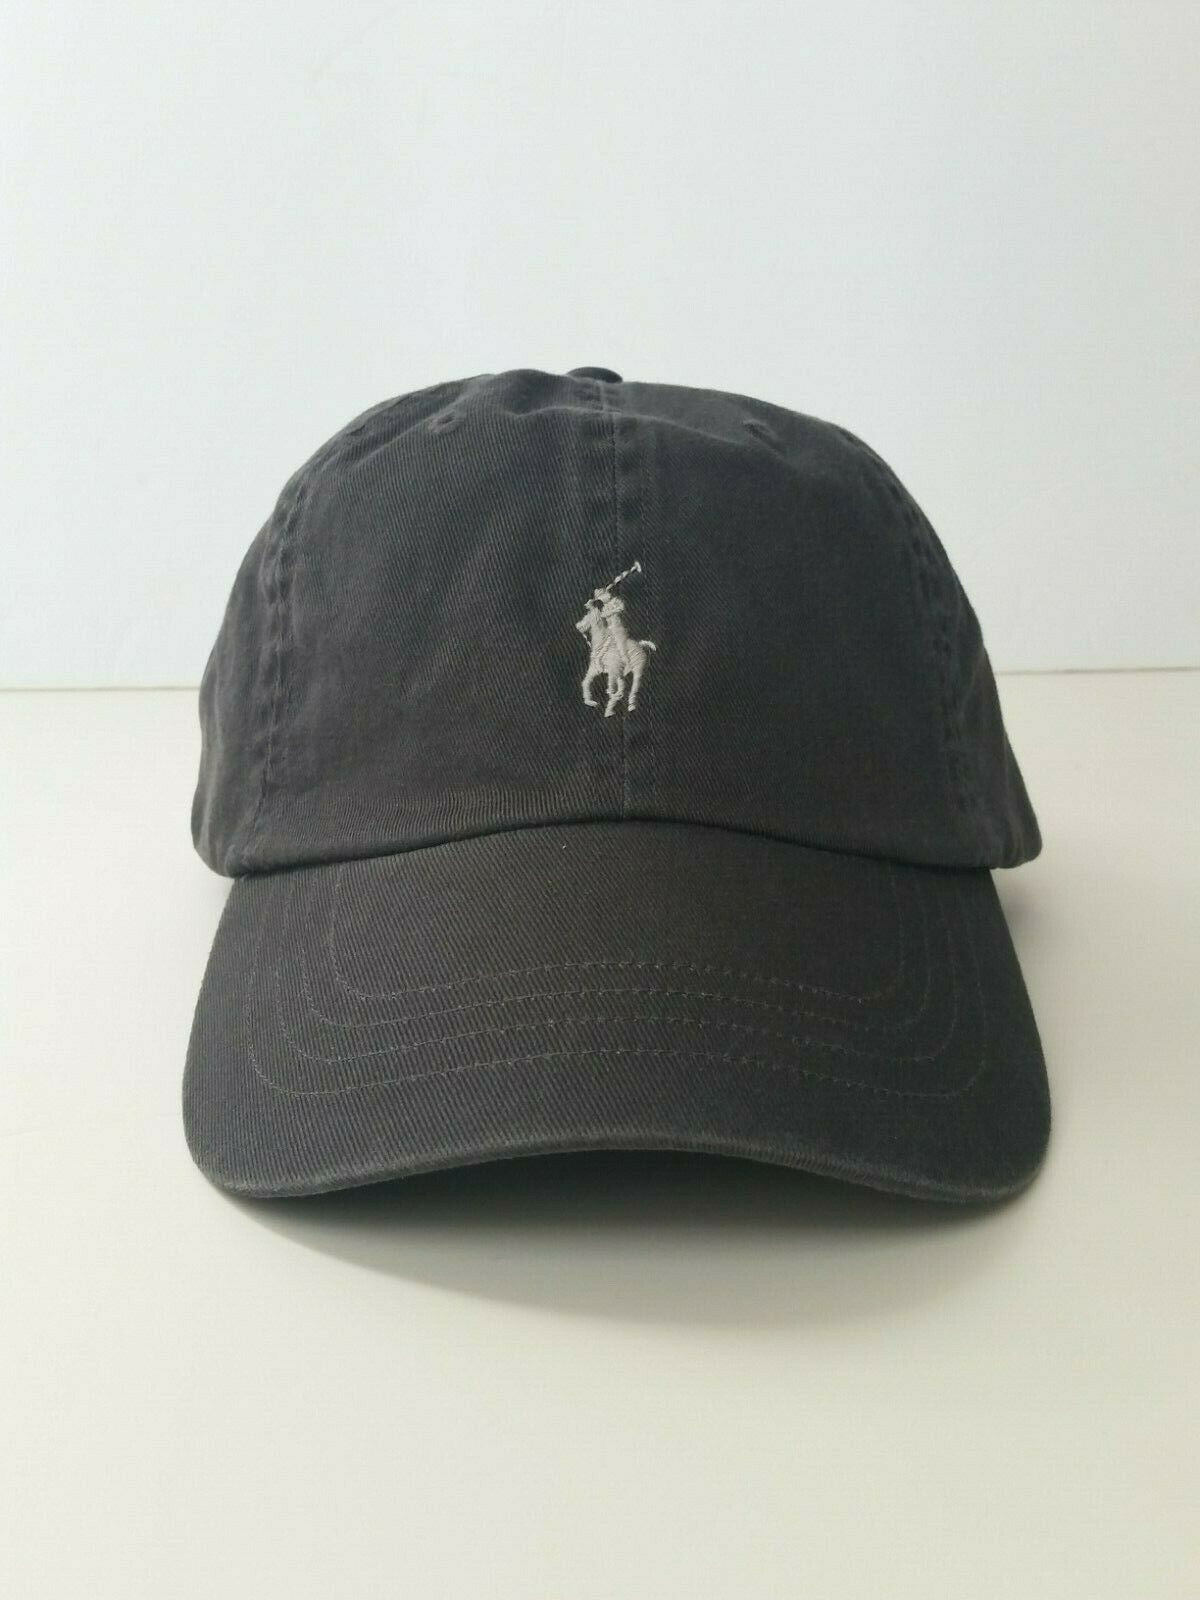 NEW Polo Ralph Lauren Baseball Cap Hat Small Pony Adjustable Strap Asst. Colors.